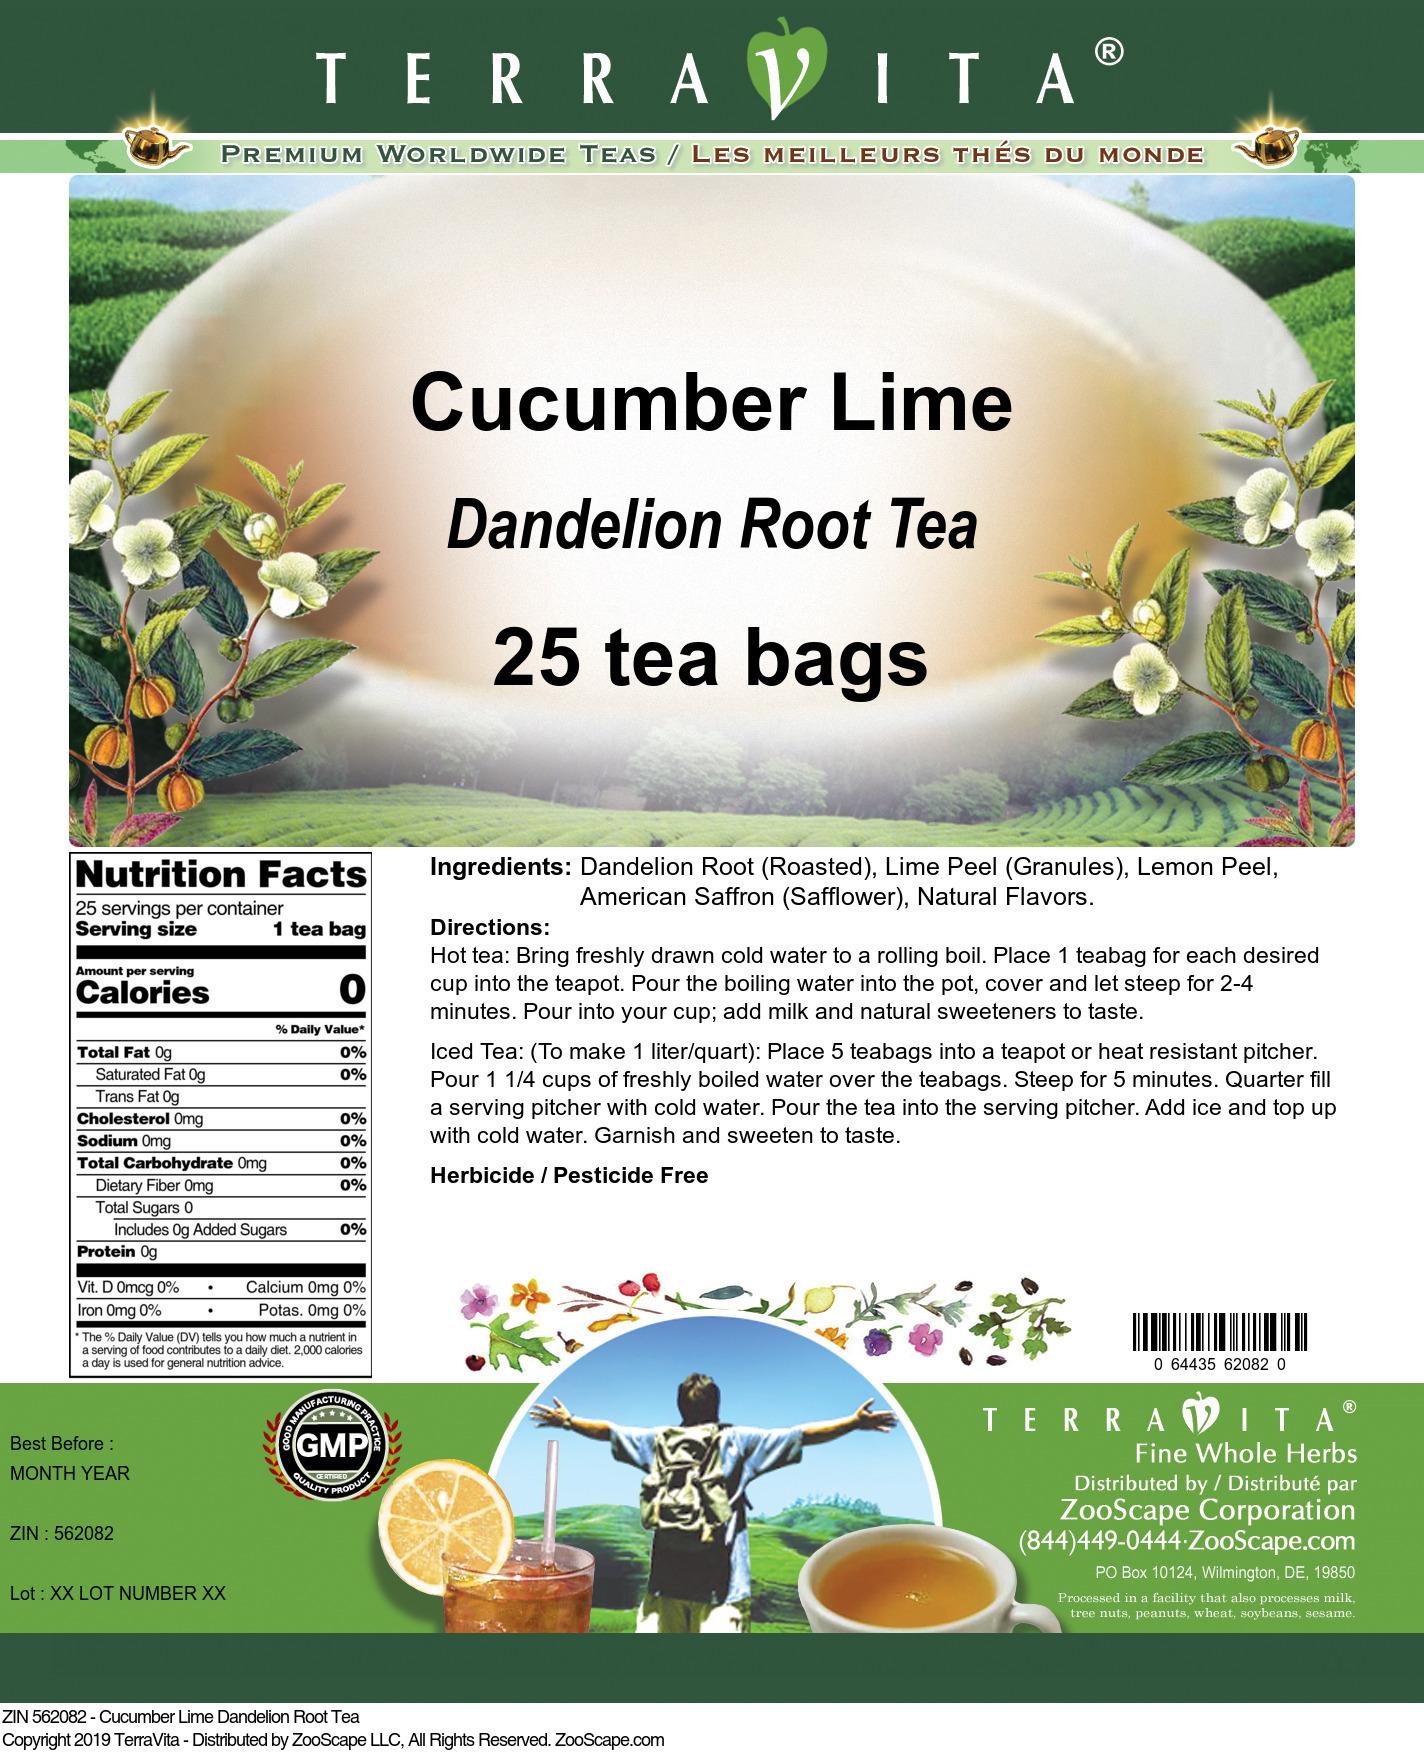 Cucumber Lime Dandelion Root Tea